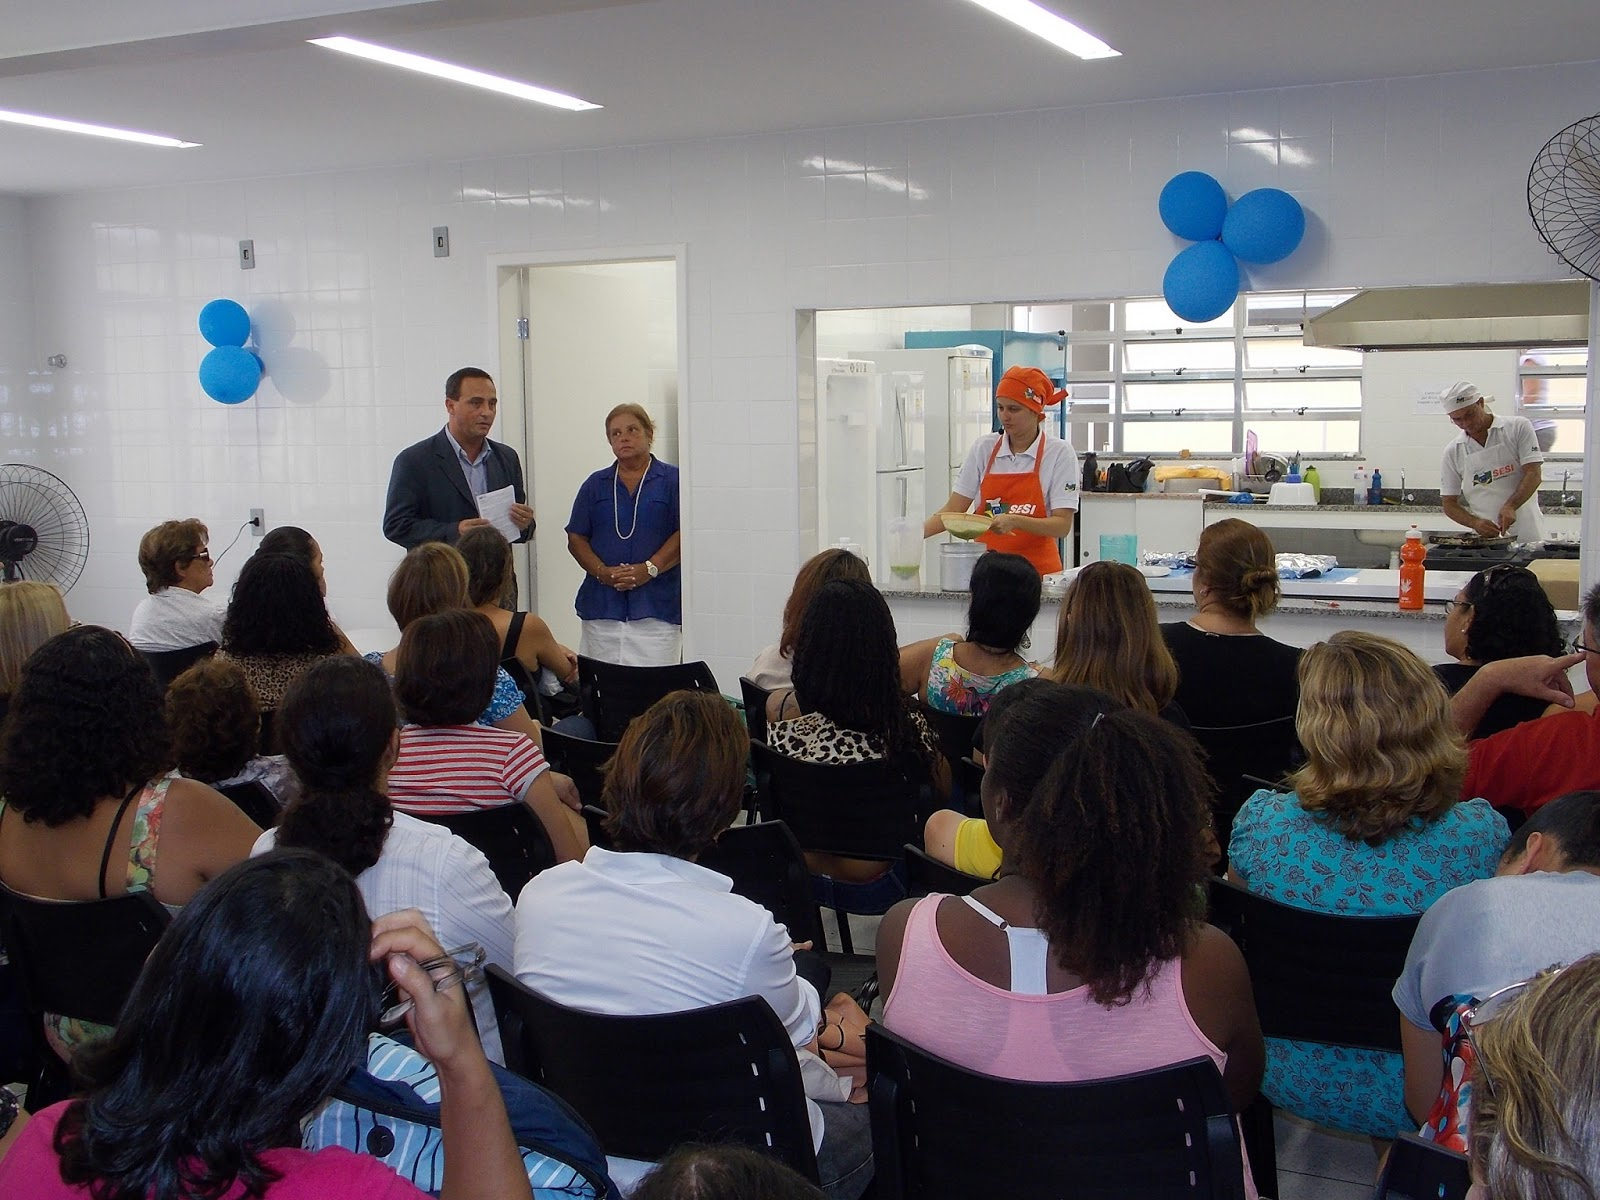 Educação Niterói: FME e SESI realizam programa Cozinha Brasil #26668A 1600 1200